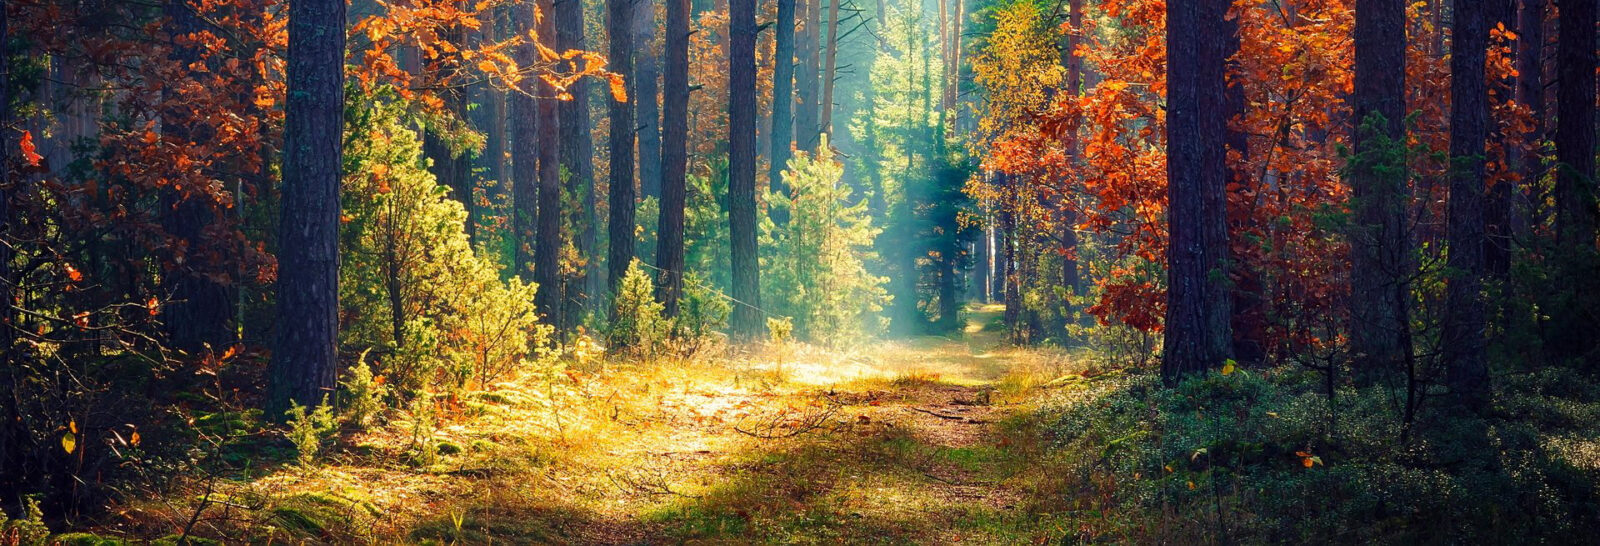 Soler - Nous rejoindre - Production - Forêts